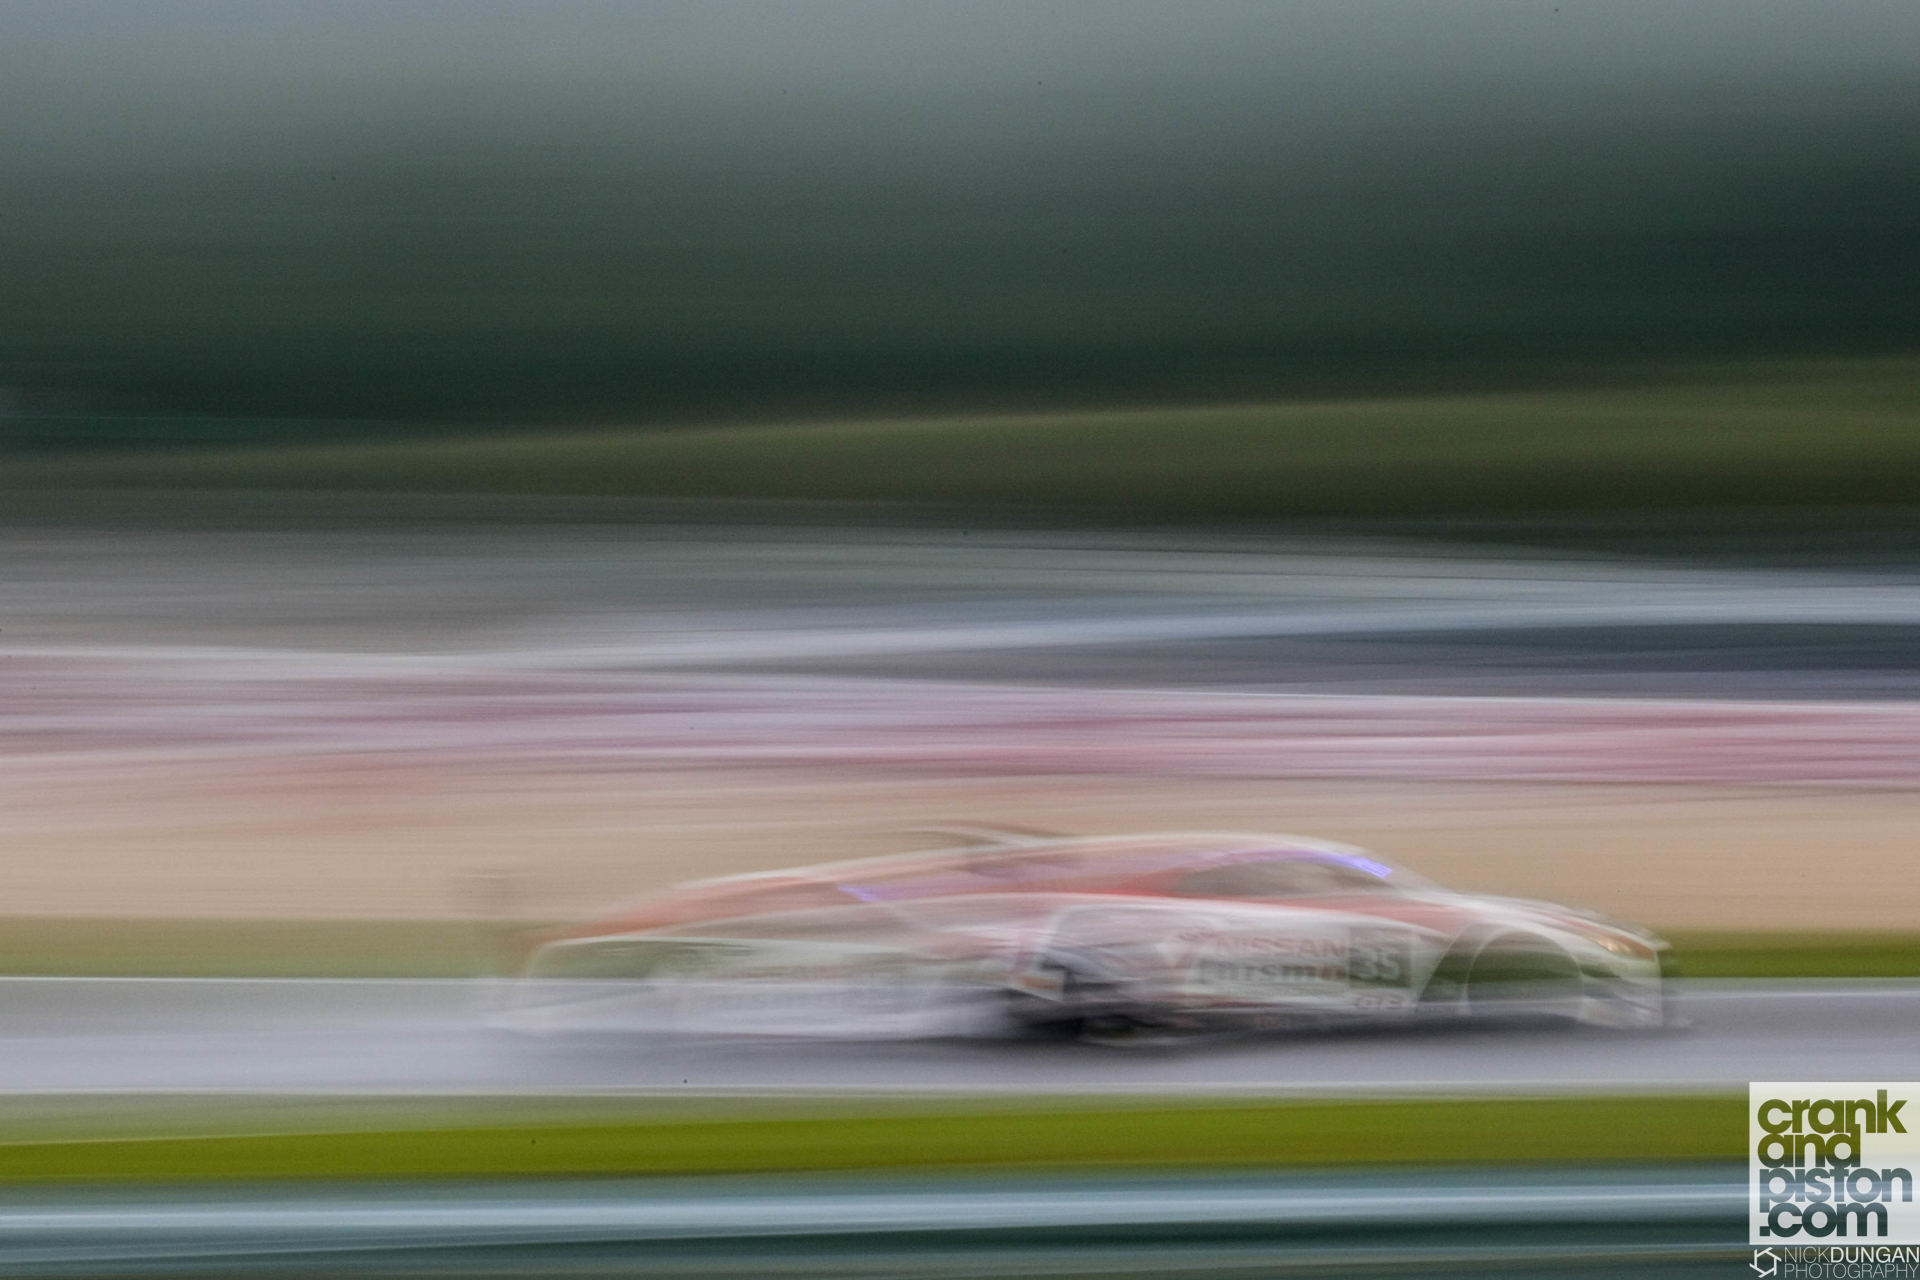 Wolfgang Reip, Miguel Faisca, Katsumasa Chiyo|Nissan GT Academy Team RJN|Nissan GT-R Nismo GT3 - Blancpain i-Racing N¸rburgring 1000 at N¸rburgring -  - Germany